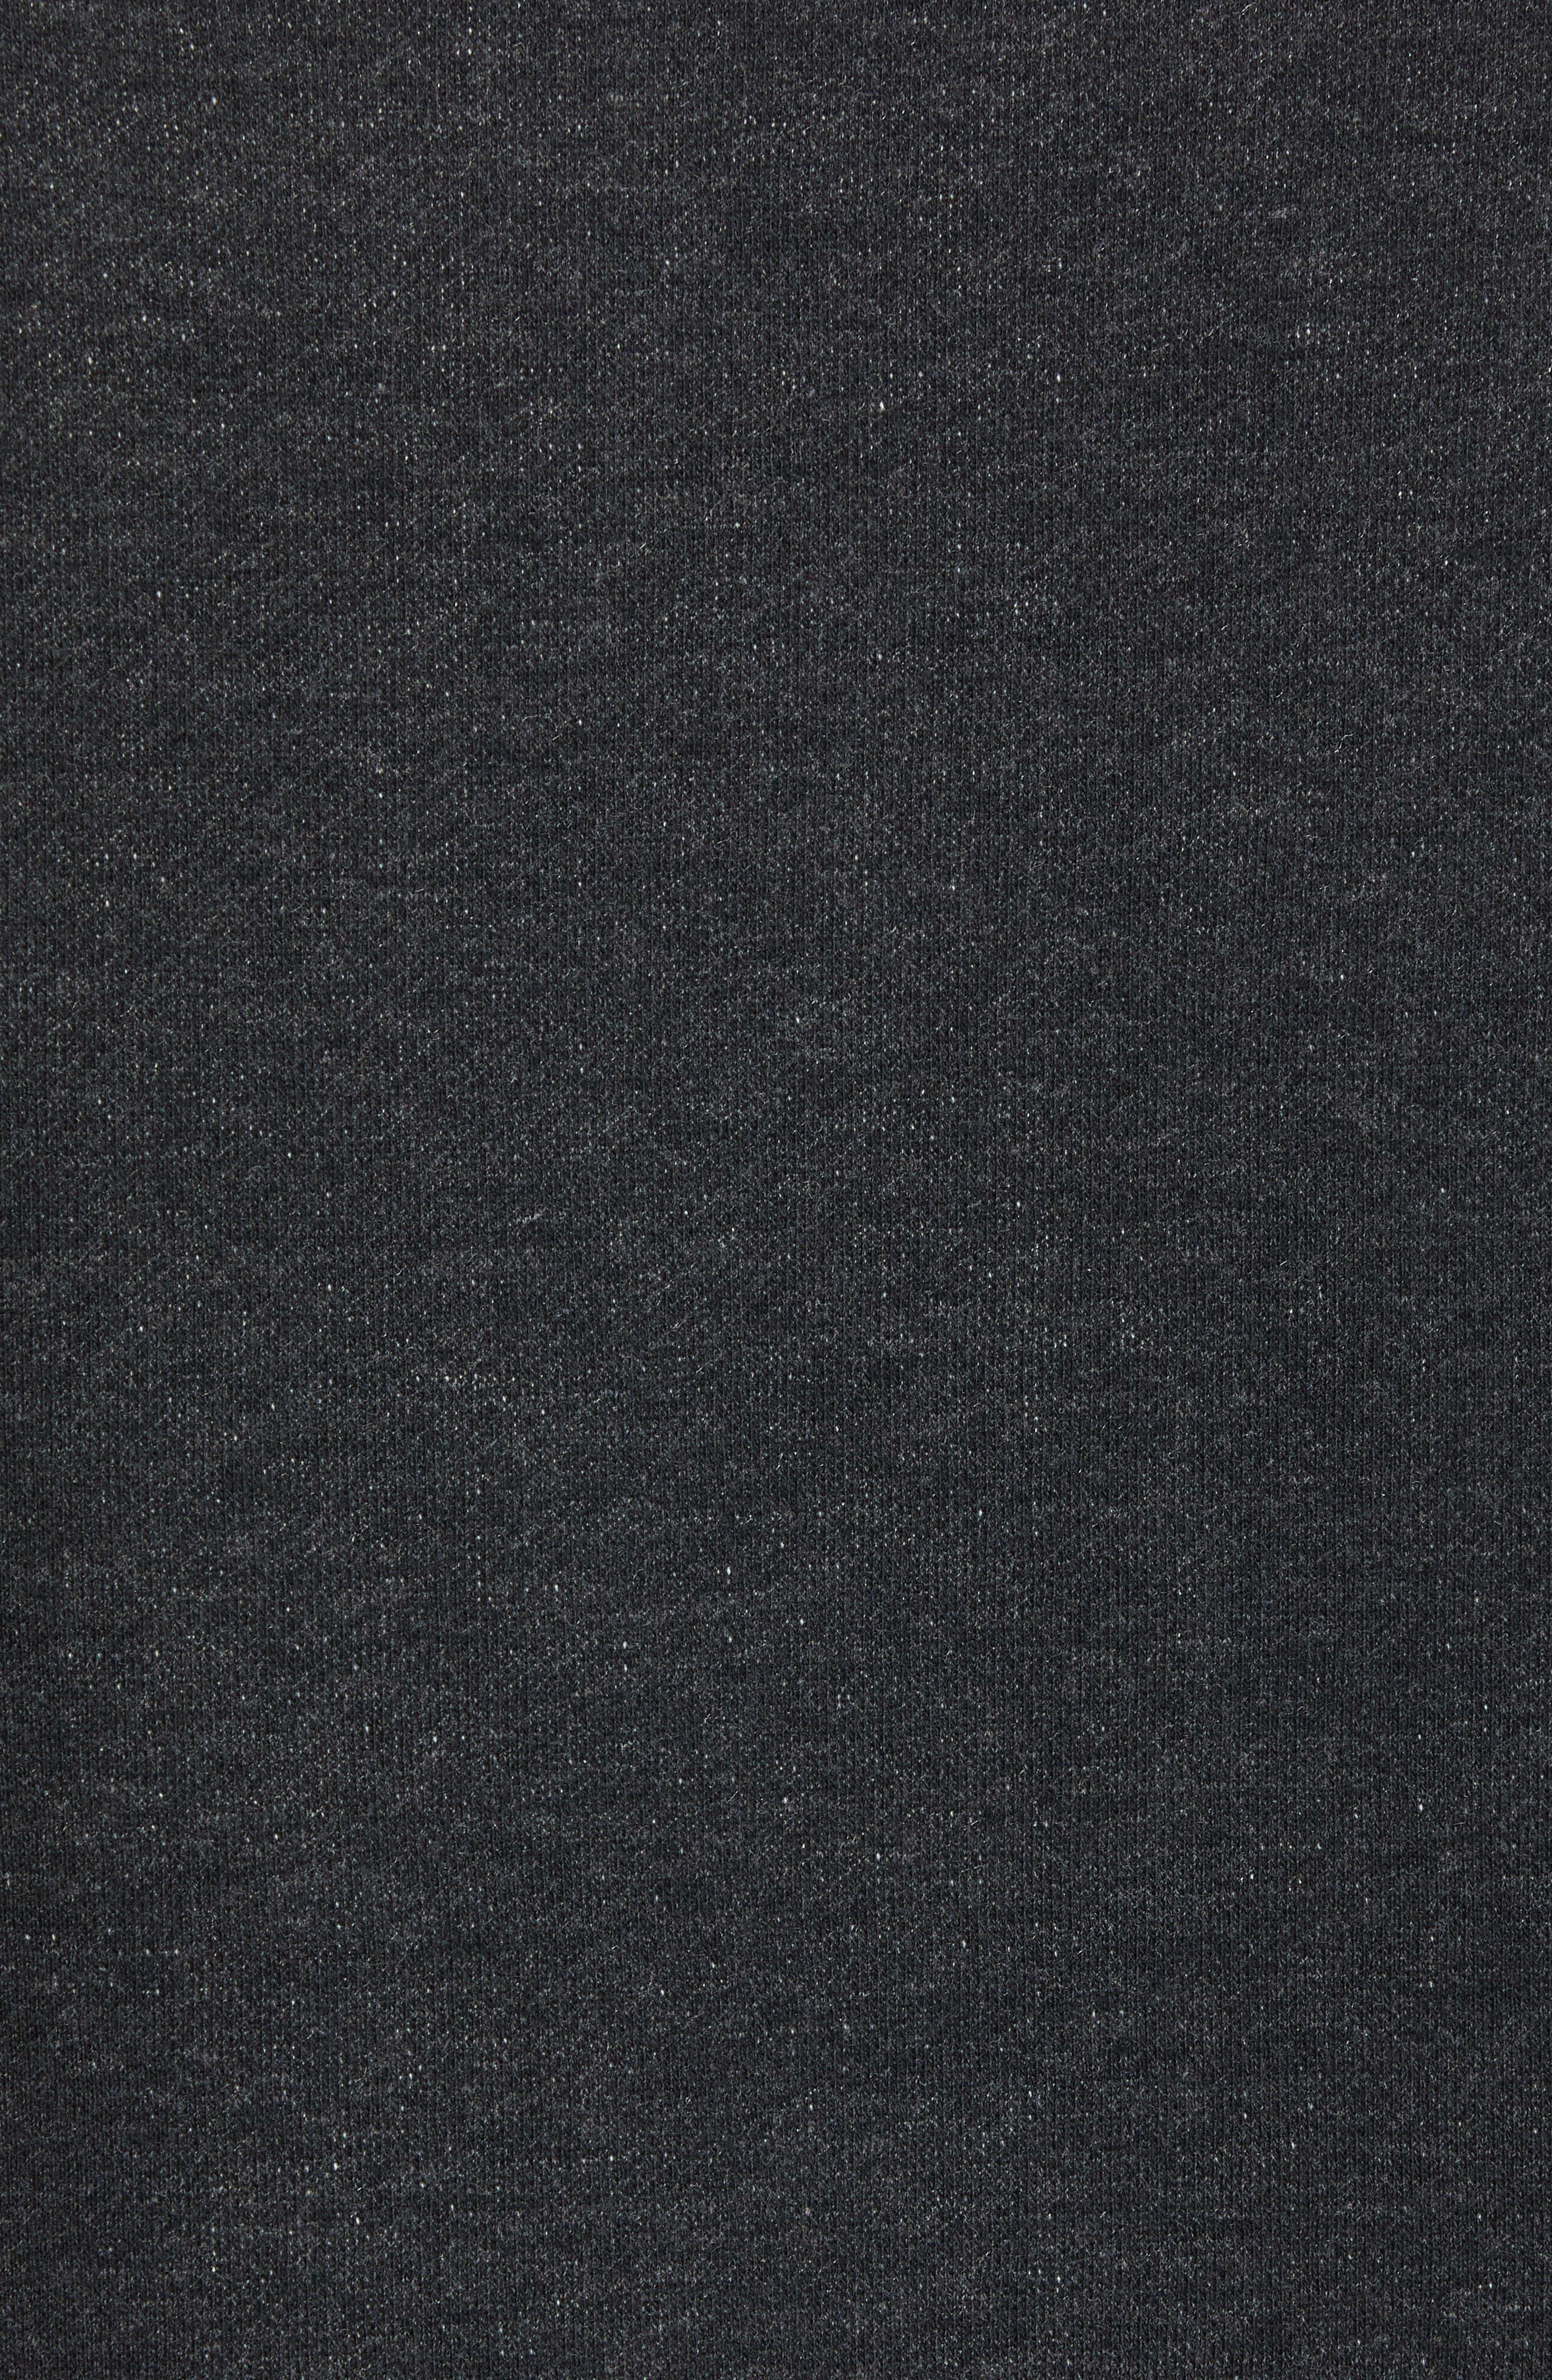 Wings Light Short Sleeve Sweatshirt,                             Alternate thumbnail 5, color,                             Black Heather/ Black